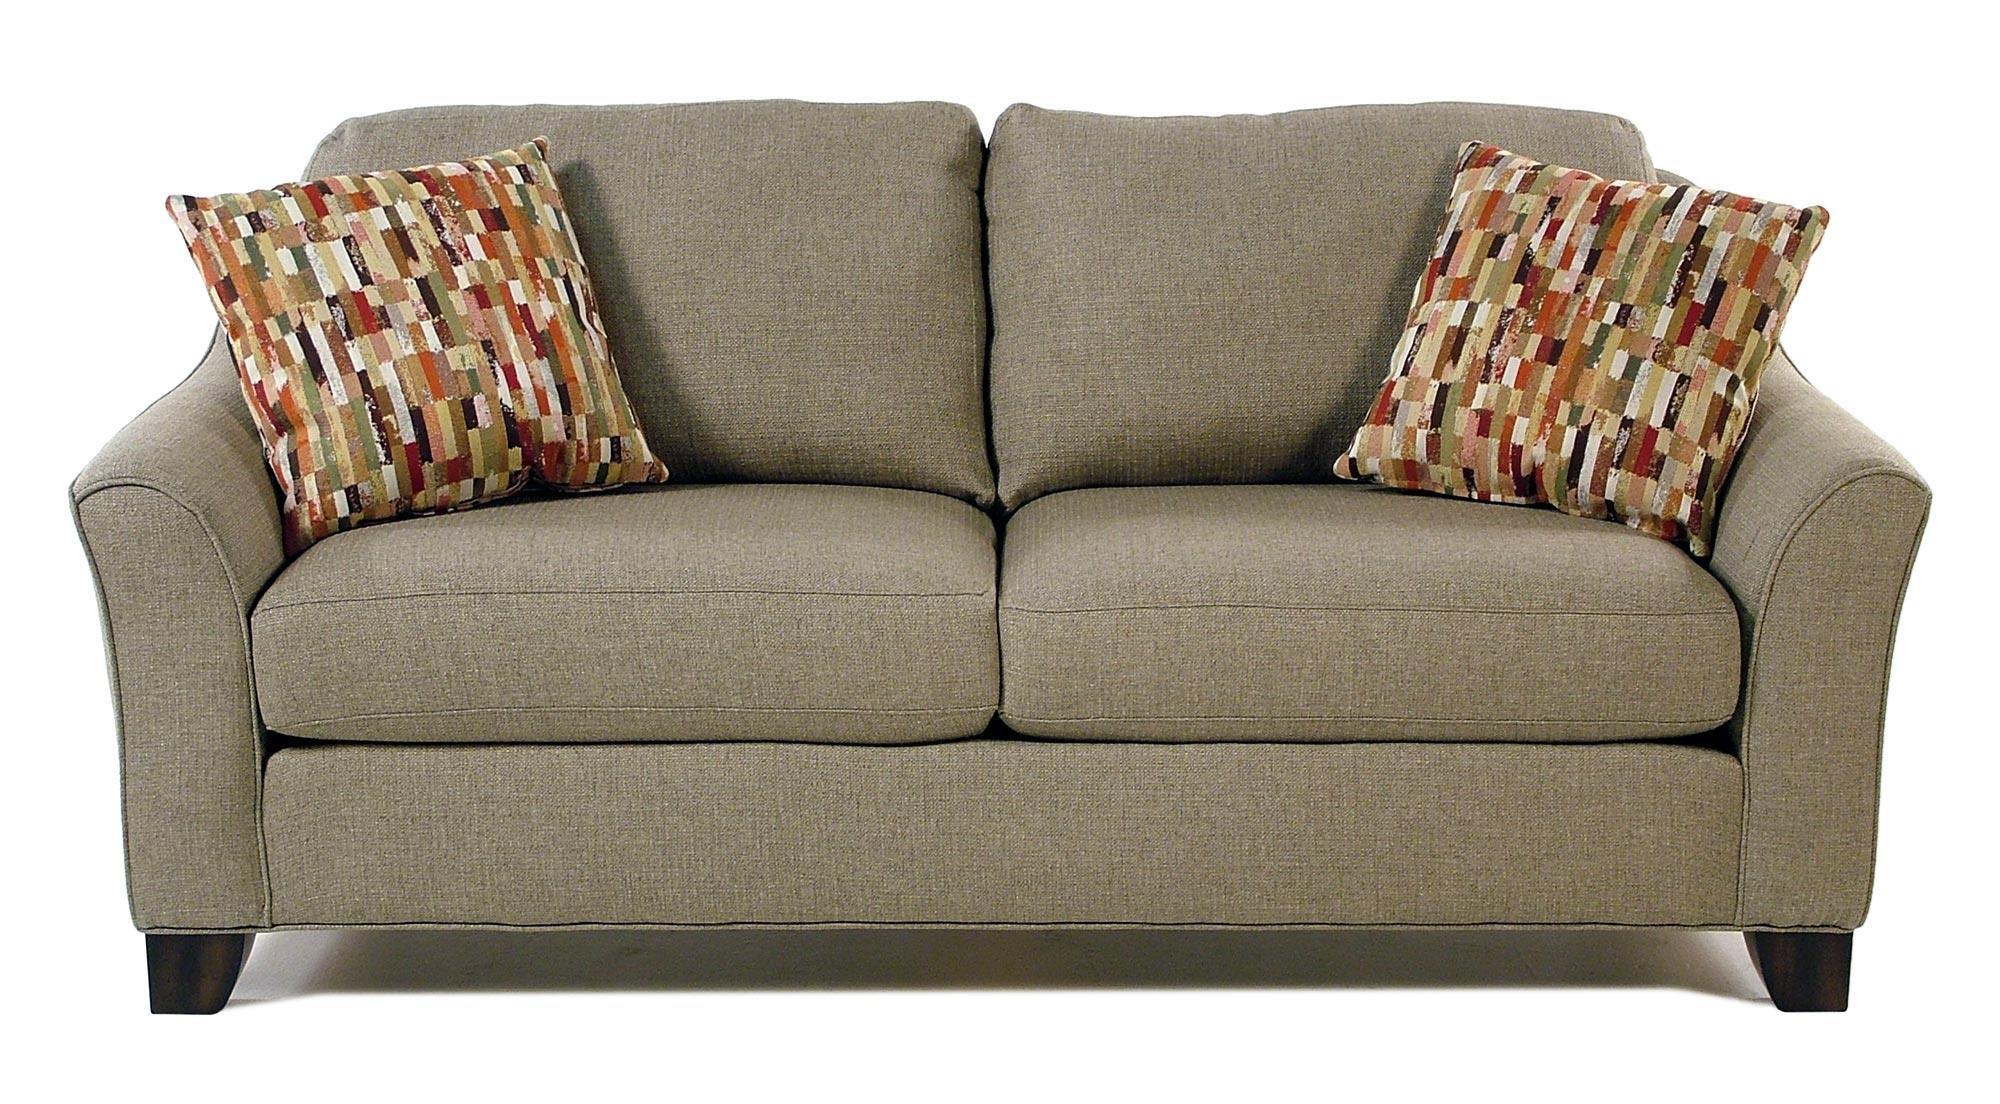 Flexsteel Caberet Flared Arm Sofa - Item Number: S5687-30-145-80